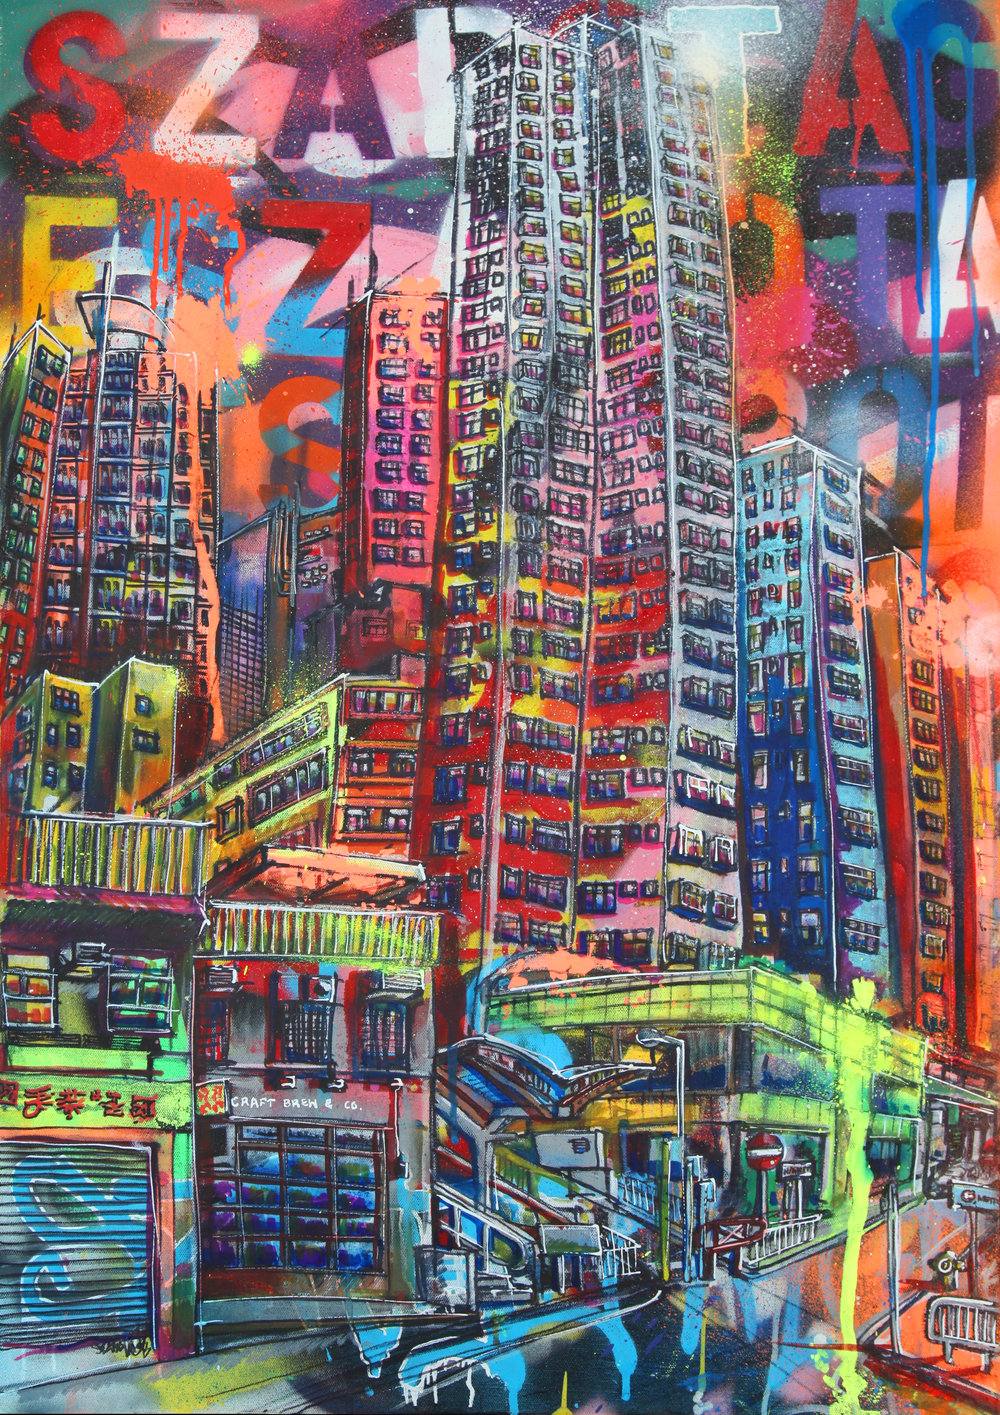 """Sai Ying Pun High Street"" Spray Paint and Graffiti Markers 60 x 92 cm 2017"